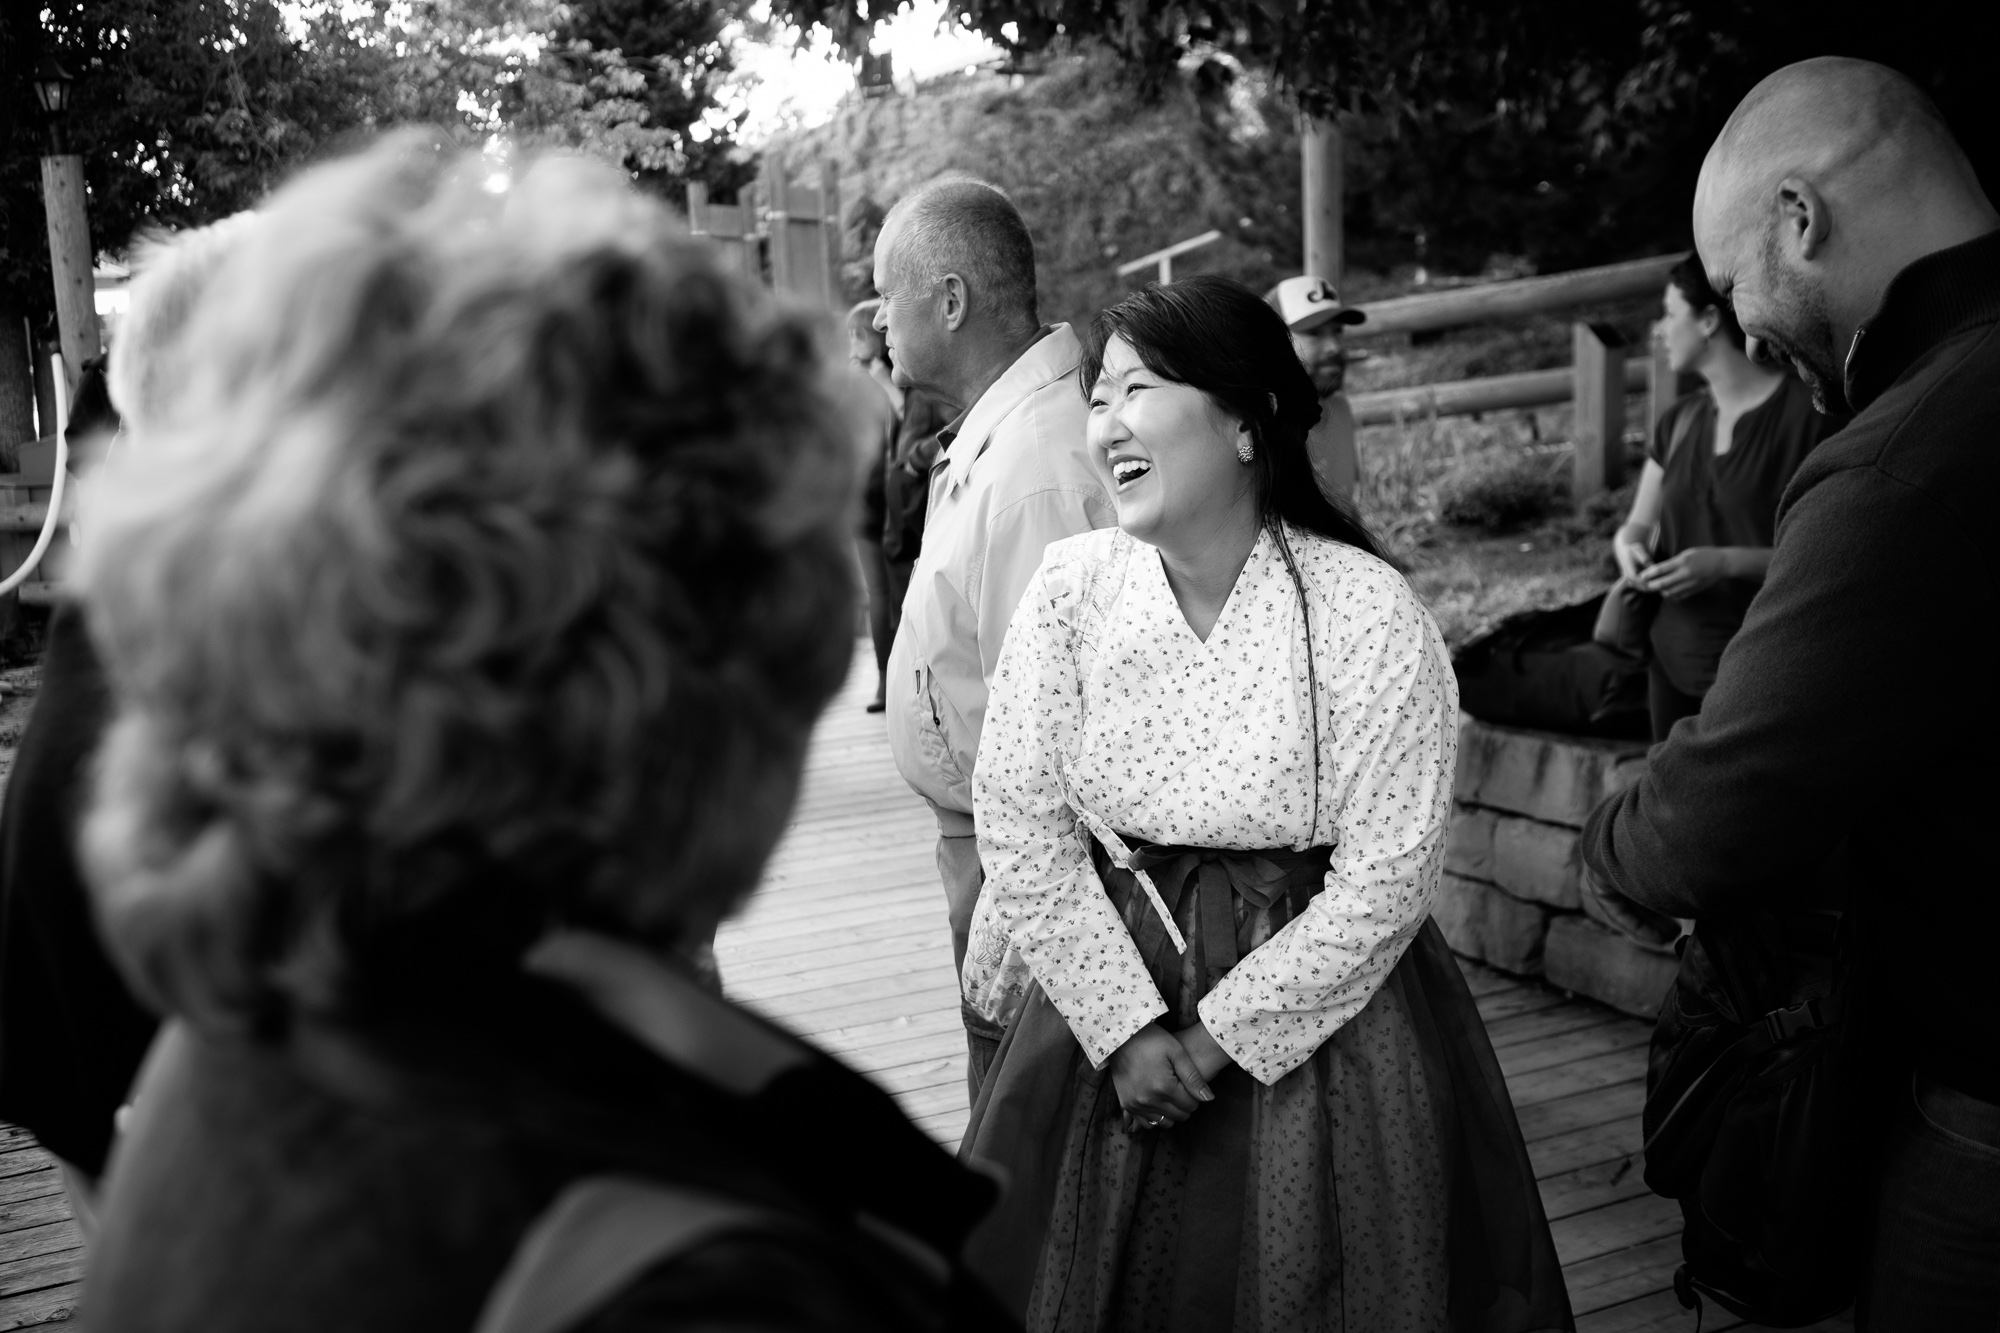 tobermory-wedding-rehearsal-photography-002.jpg